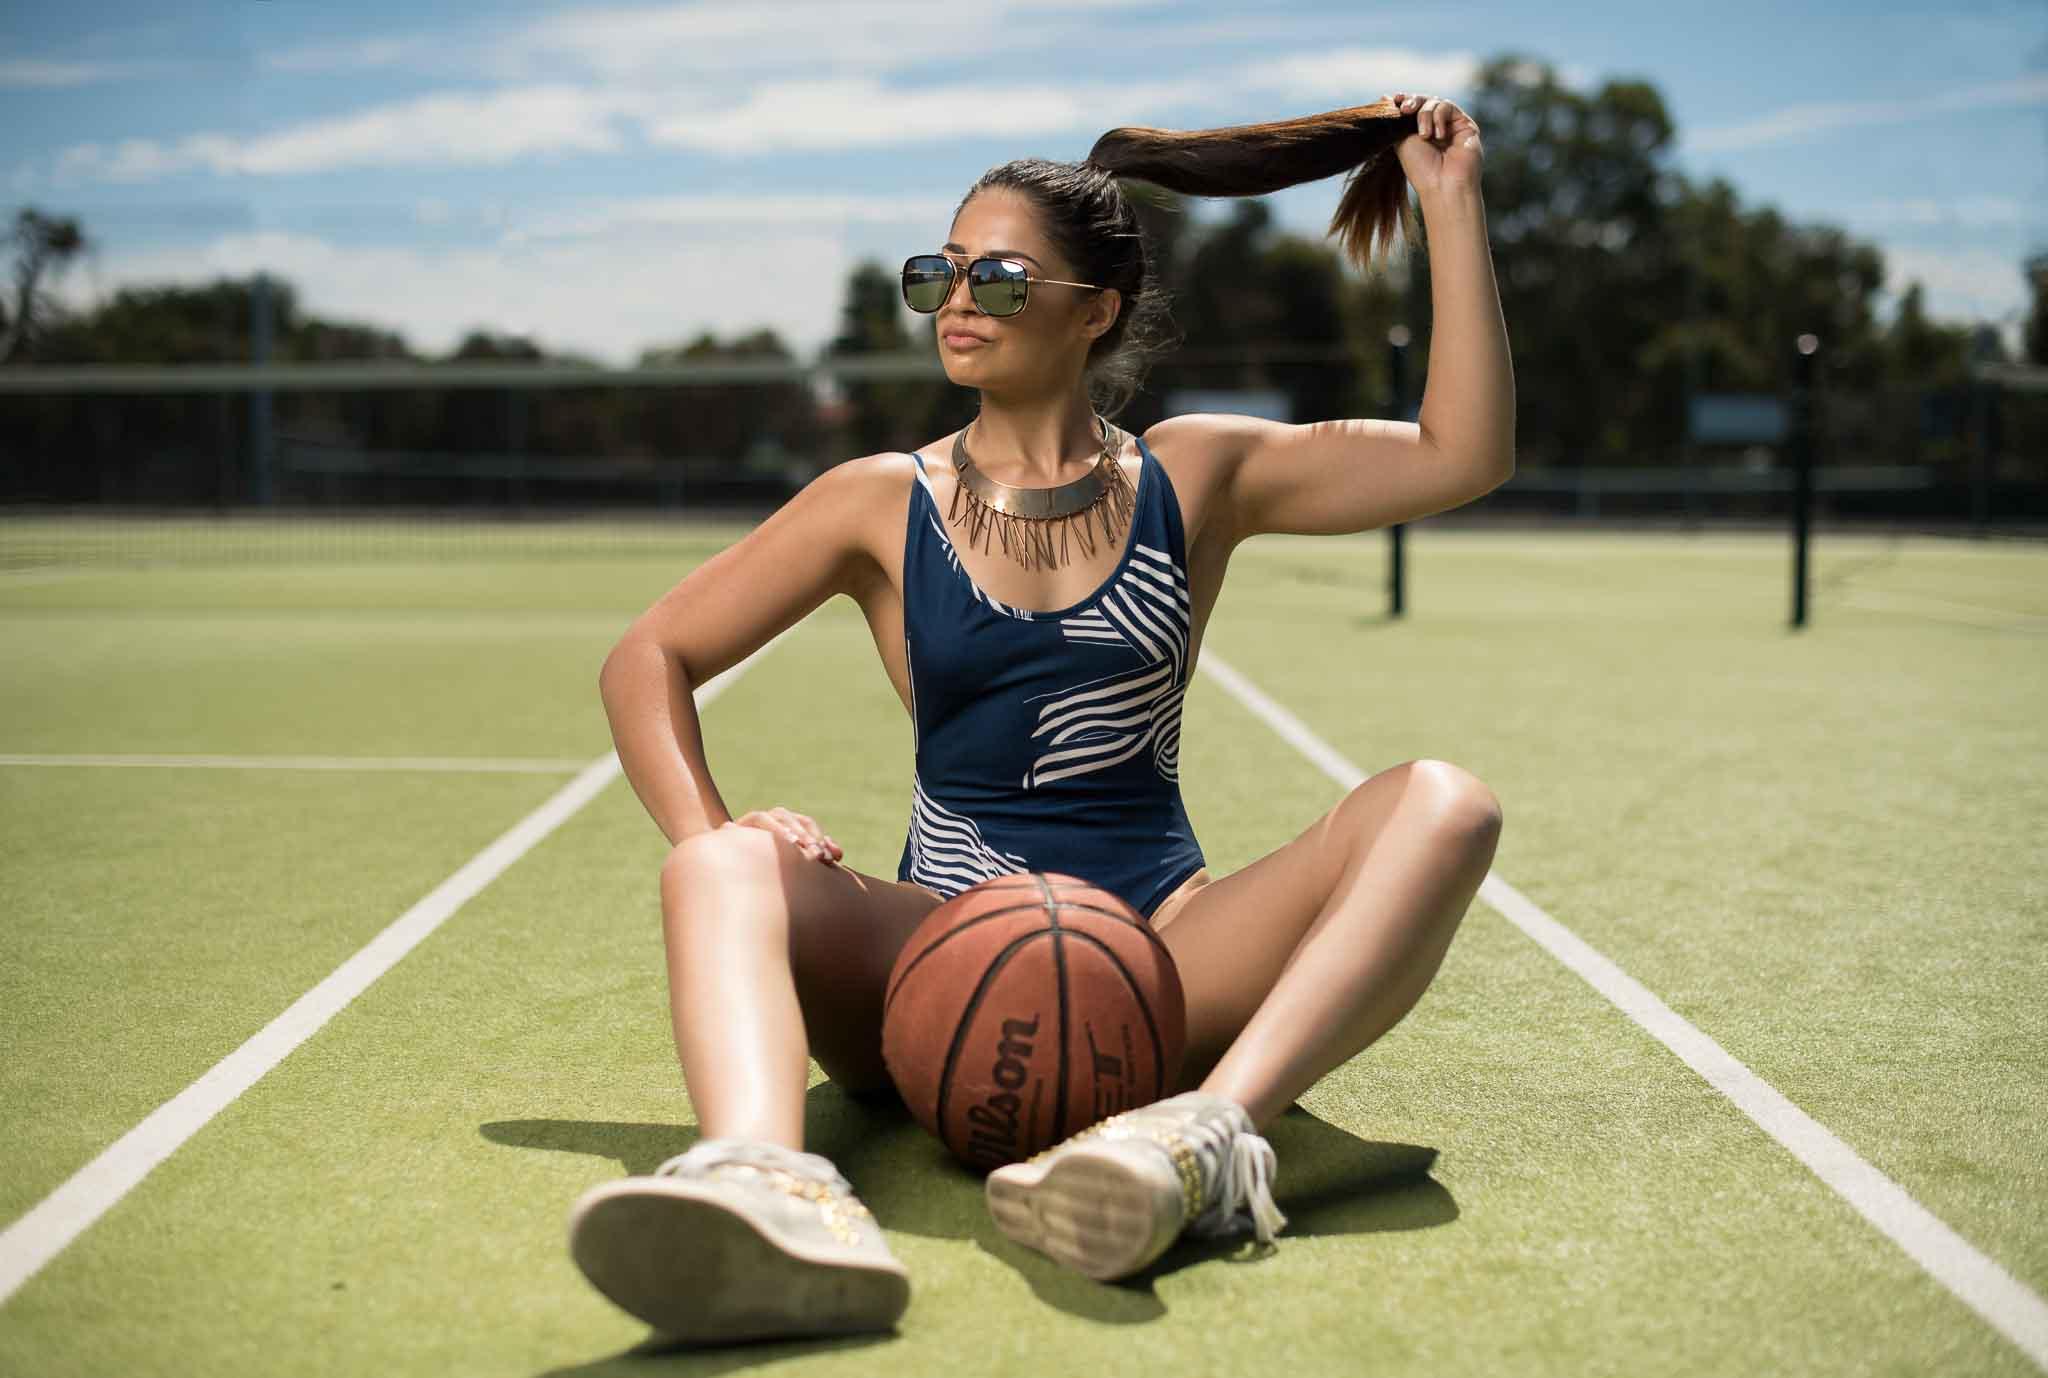 Karina Perth's female fitness model sitting on grass tennis court